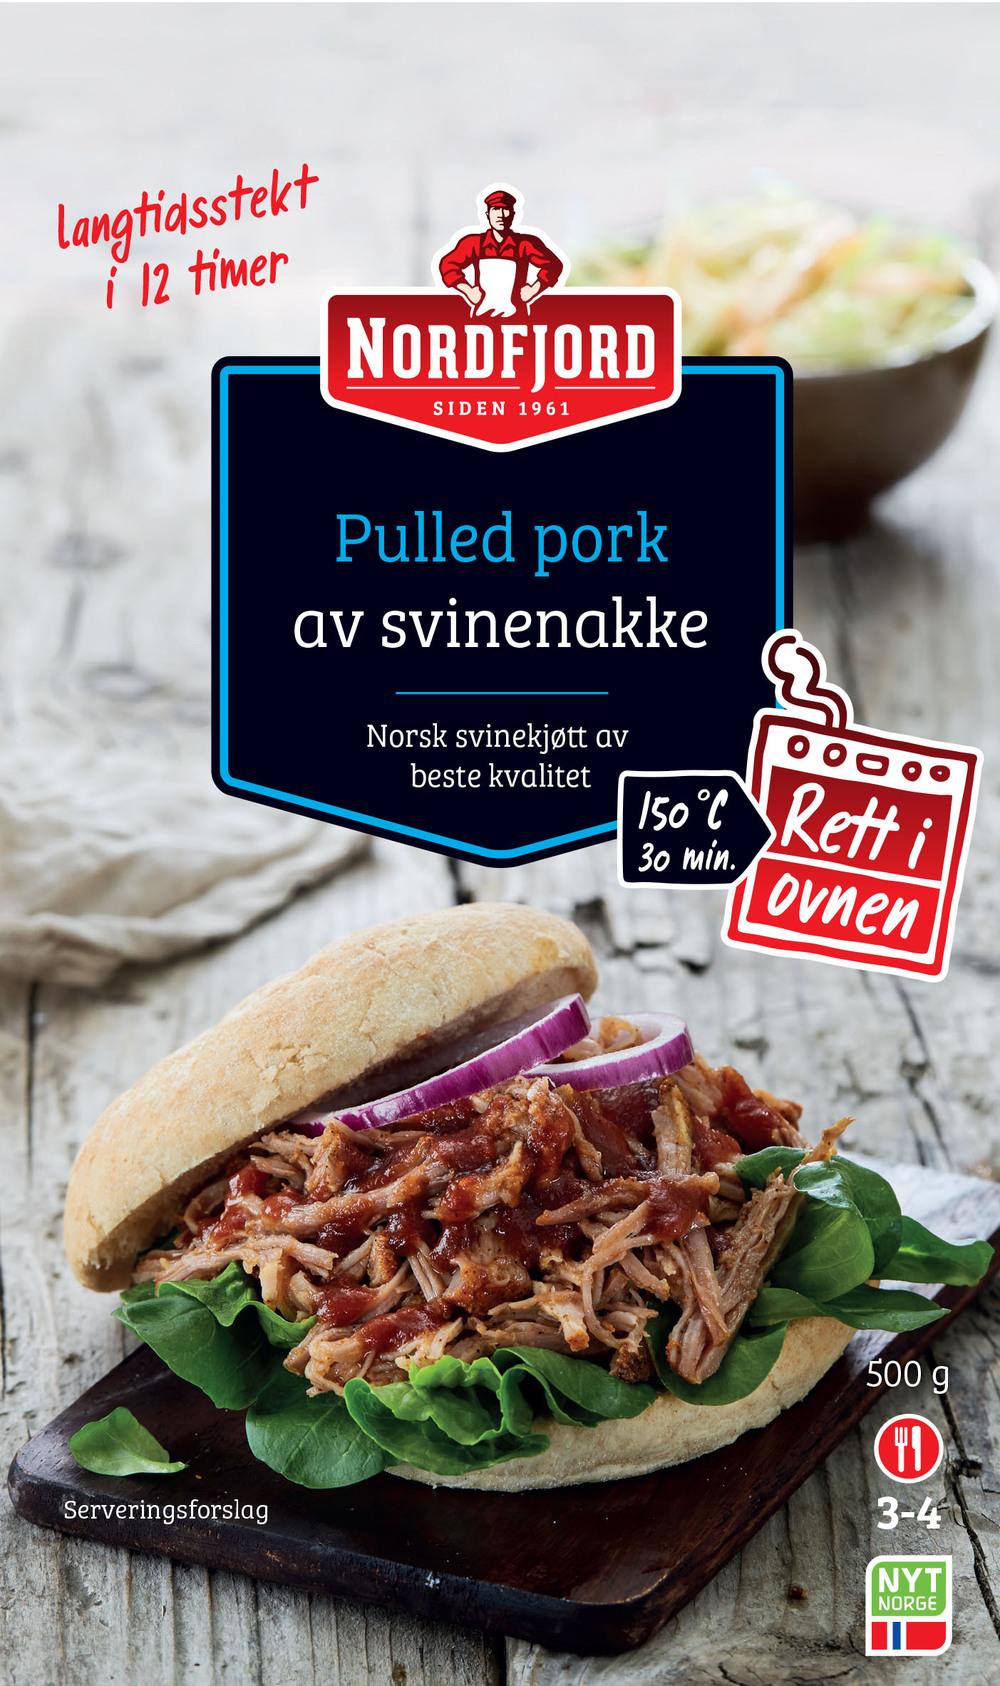 Pulled Pork, Nordfjord